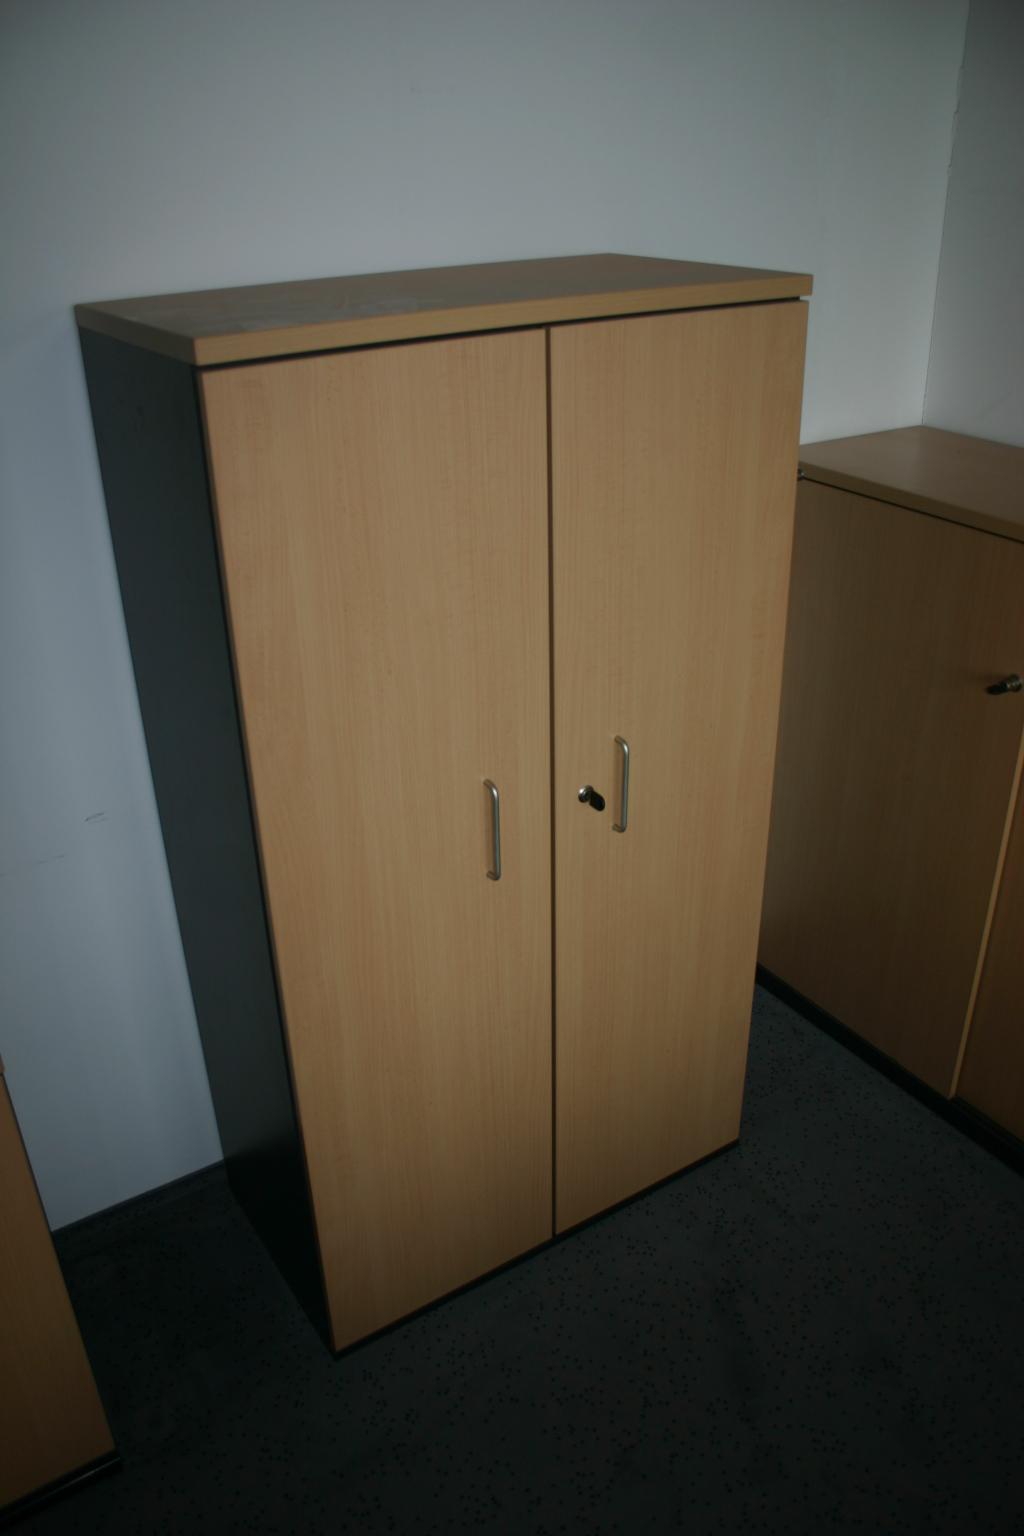 4 oh aktenschrank in buche anthrazit. Black Bedroom Furniture Sets. Home Design Ideas